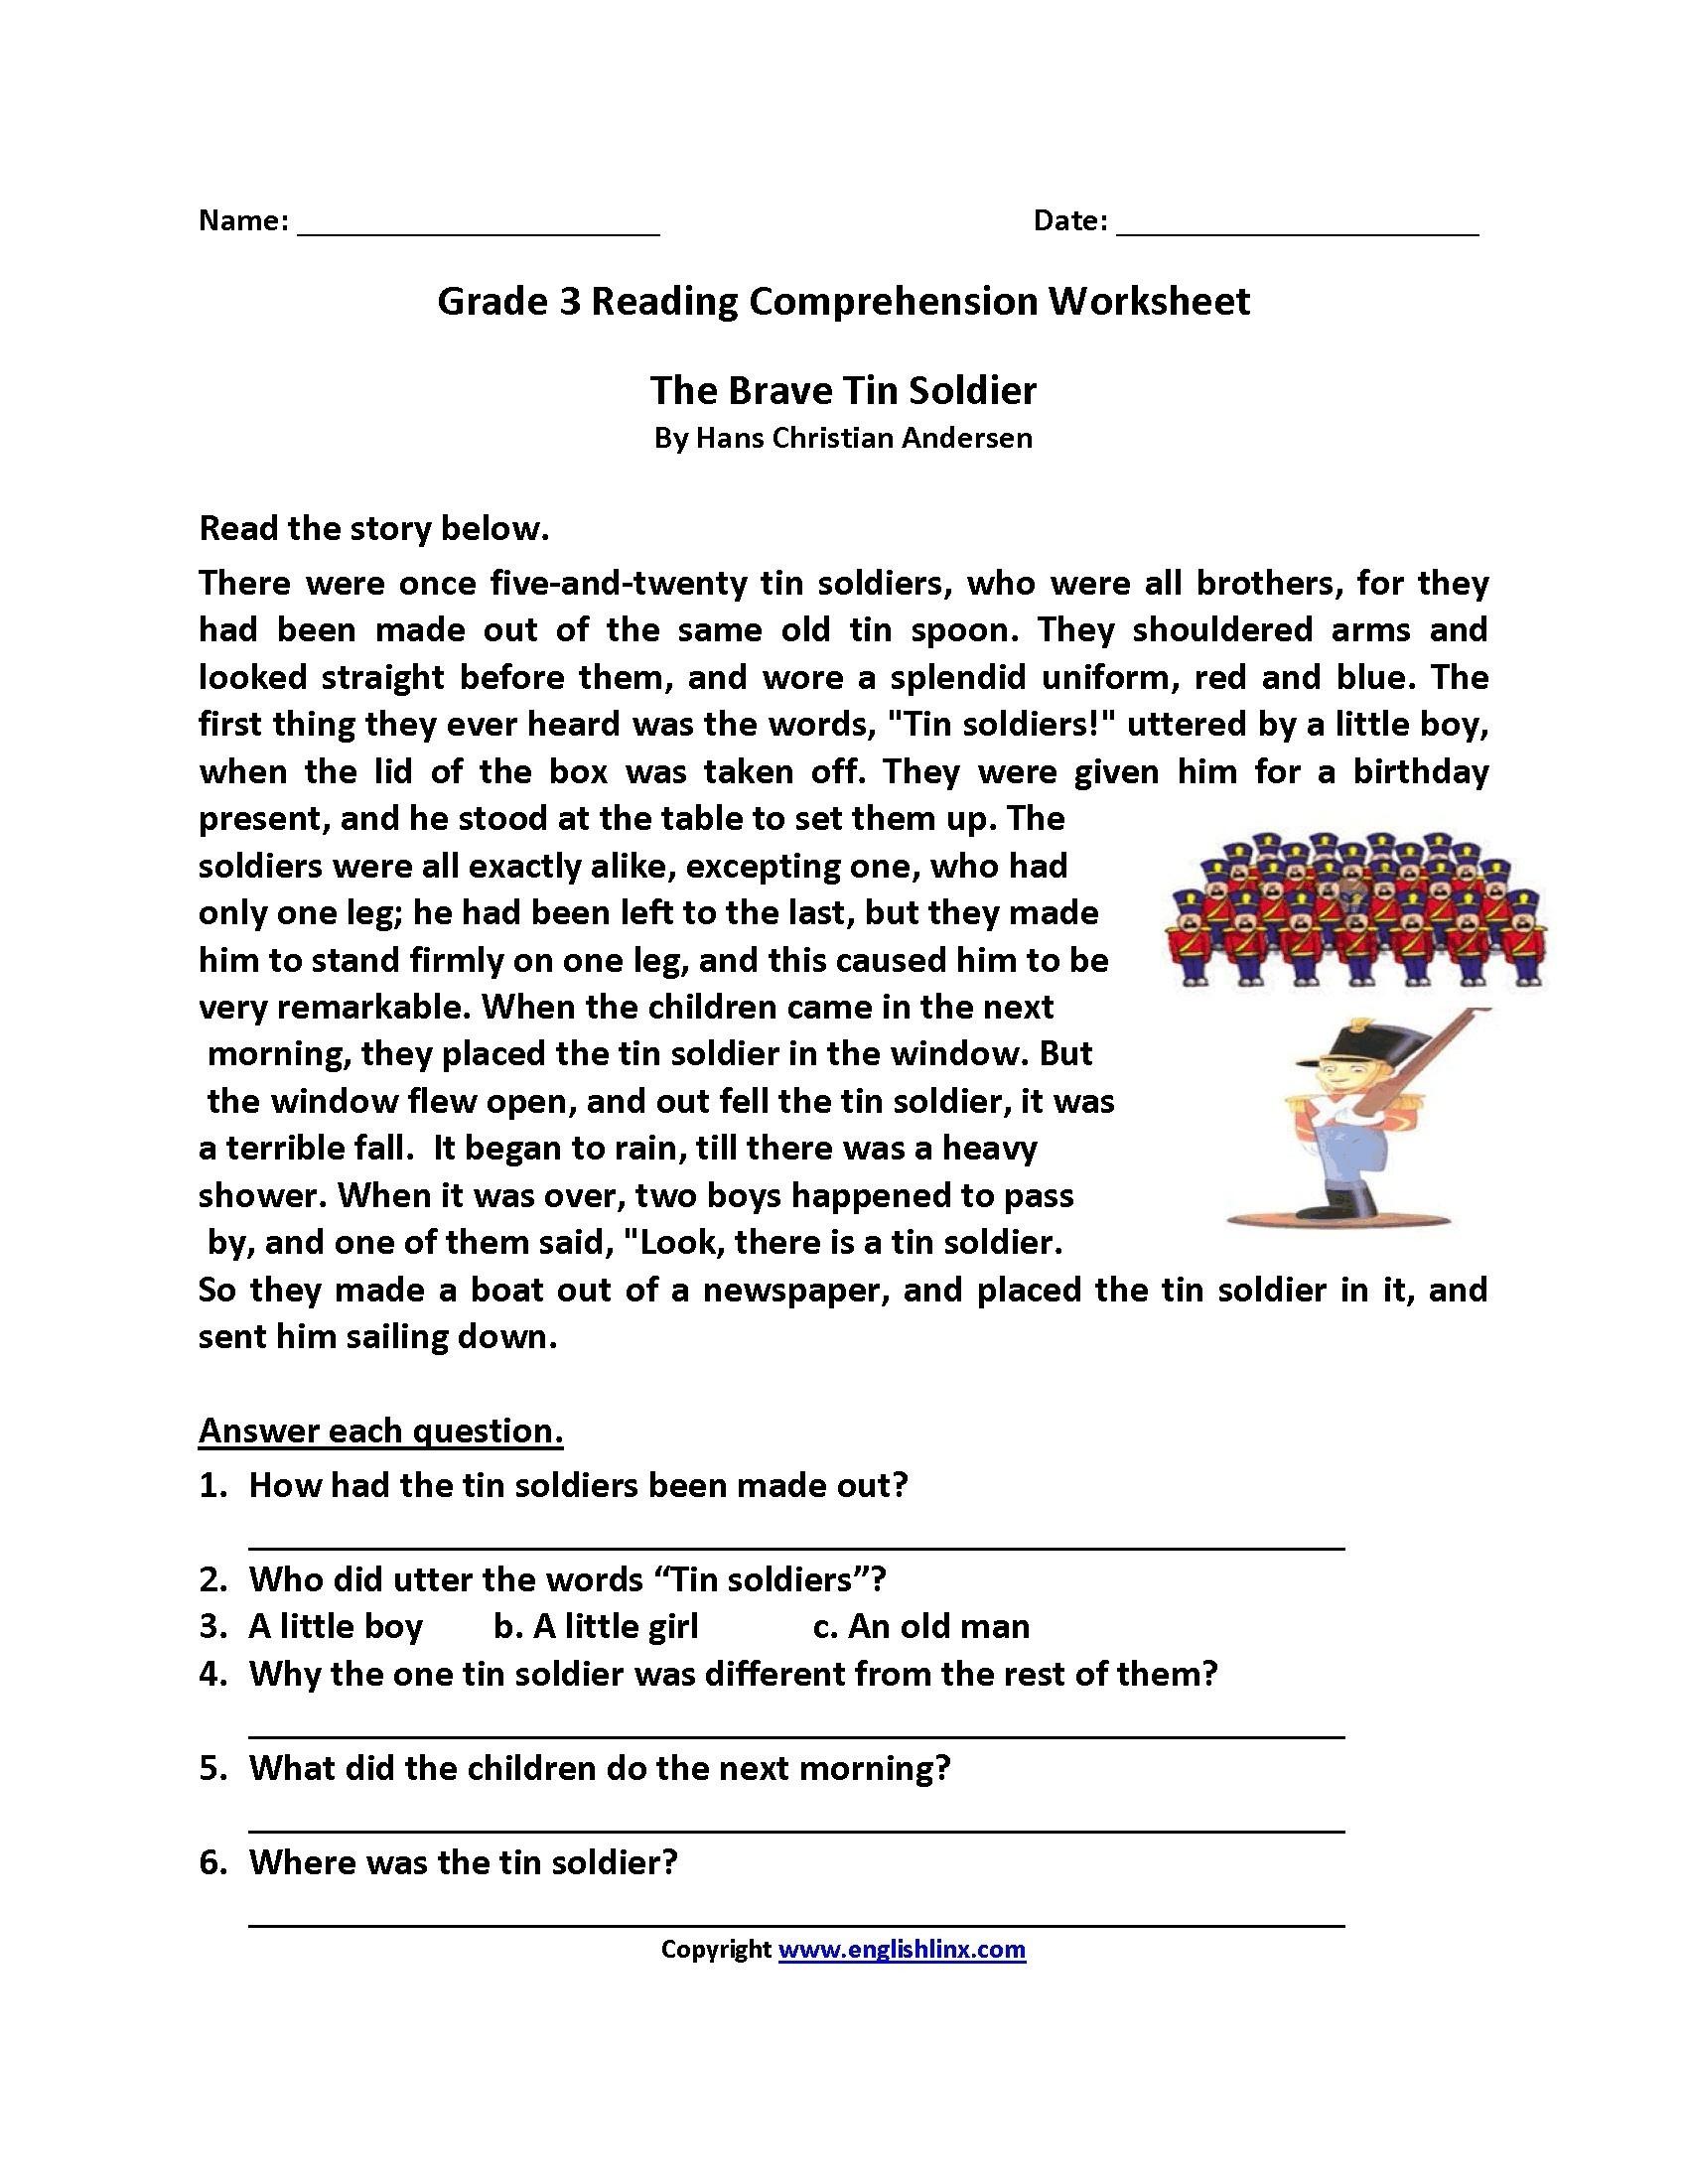 Worksheet : Free Reading Passages For 3Rd Grade Year English - Free Printable Reading Passages For 3Rd Grade